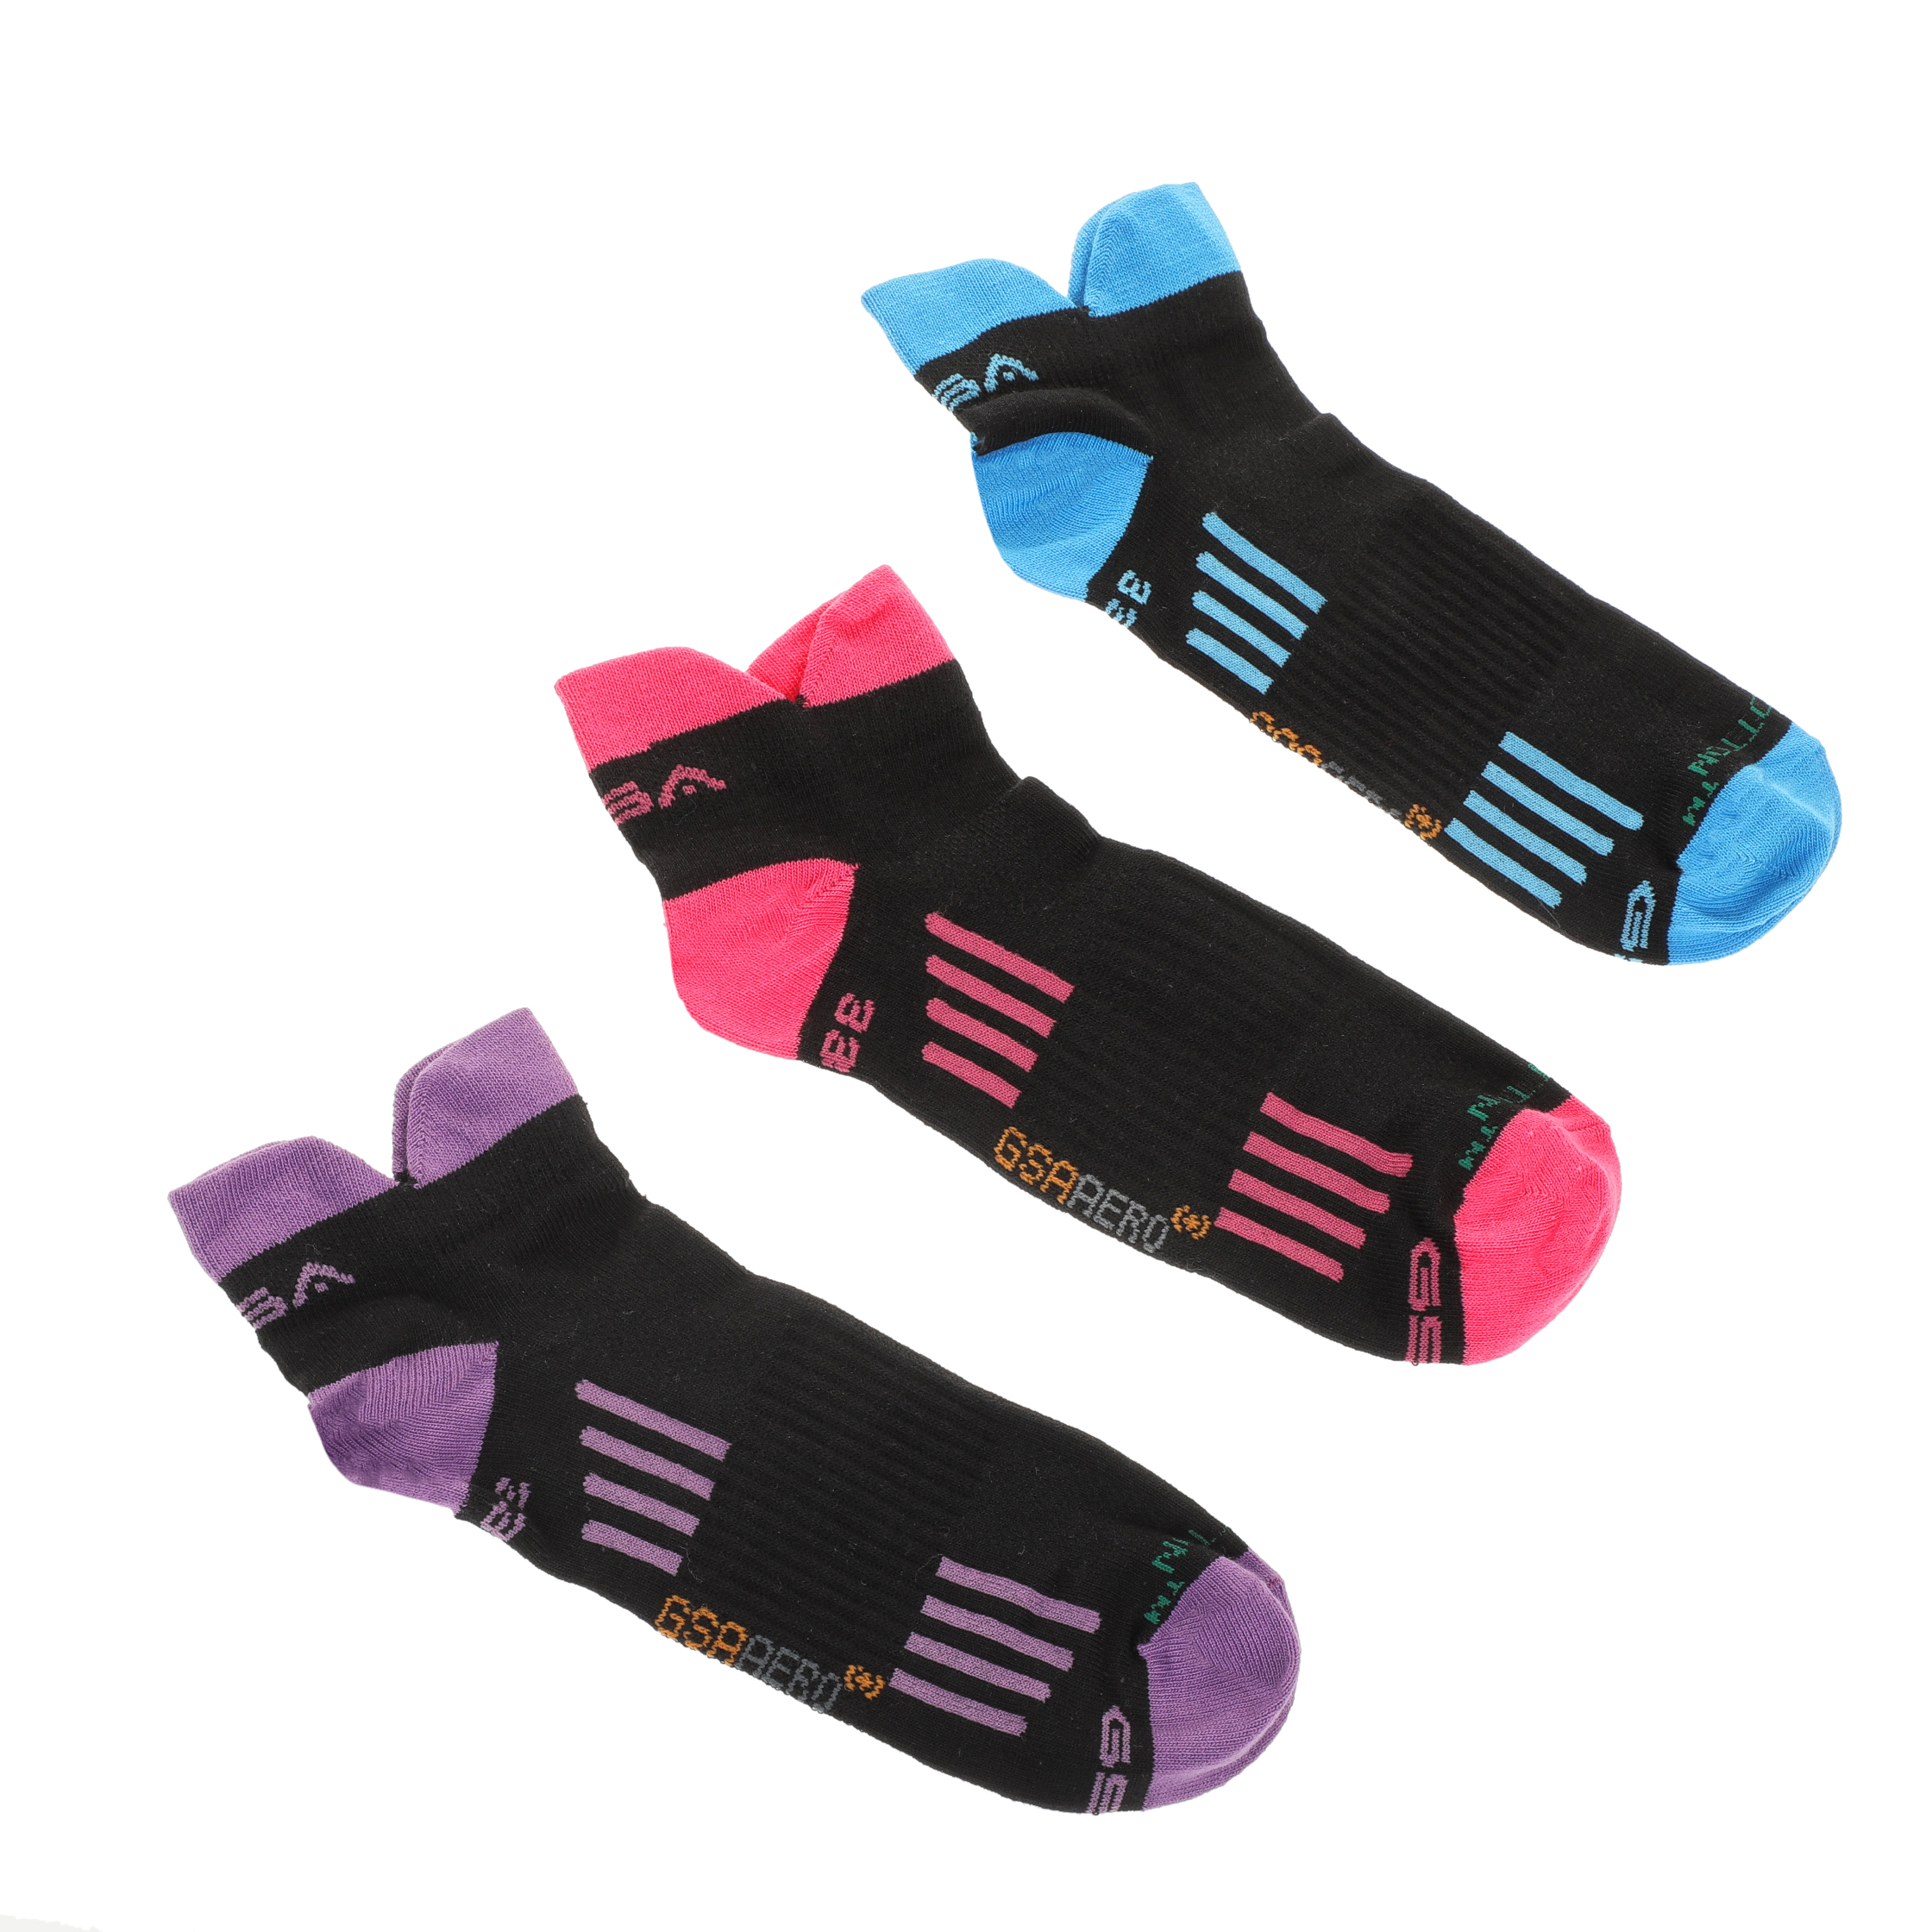 GSA – Σετ γυναικείες κάλτσες GSA AERO 330 TRAINER